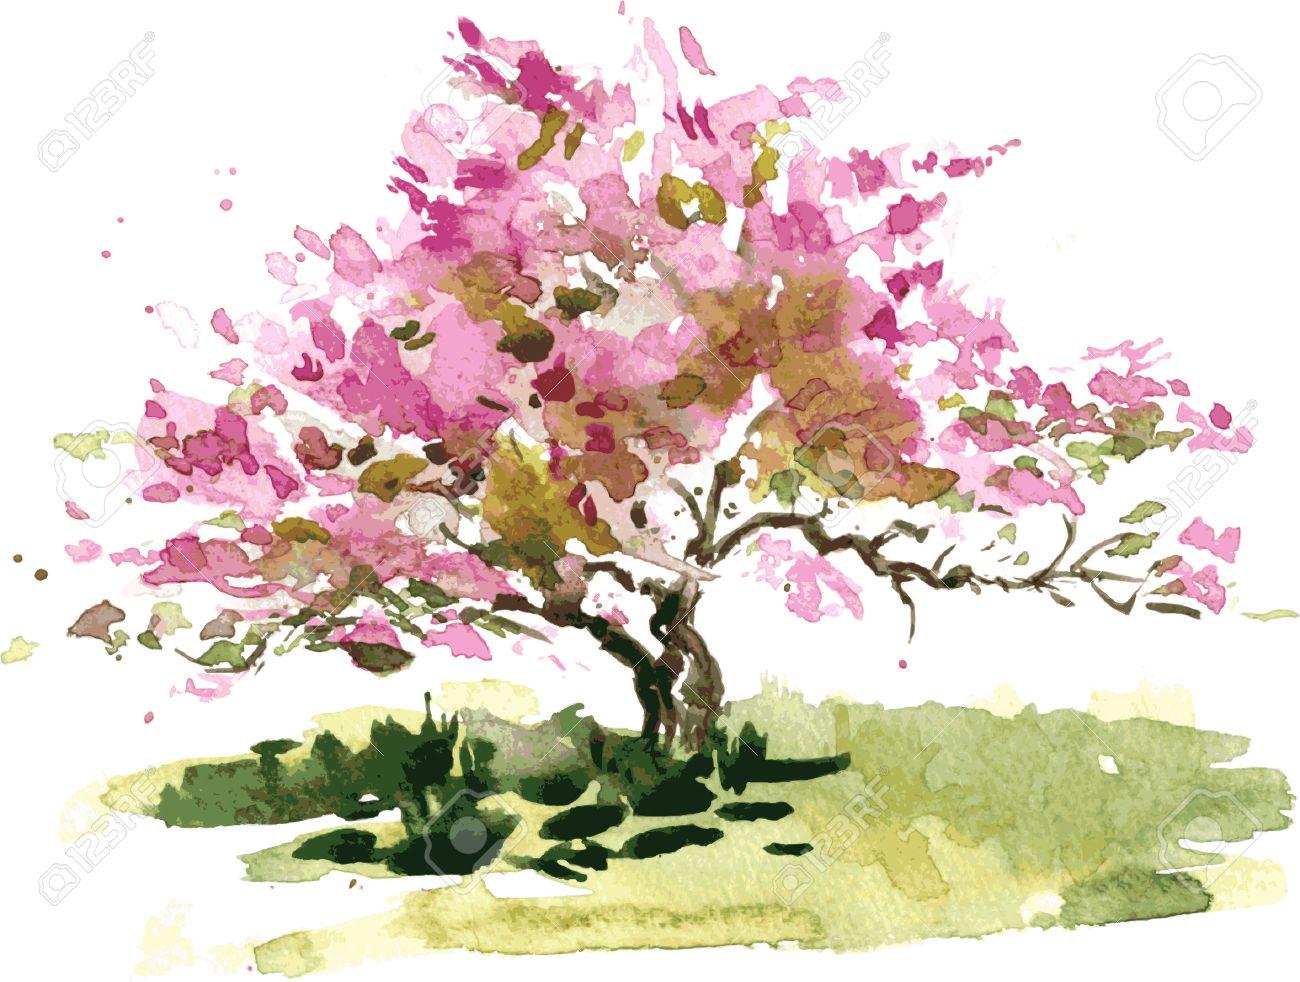 Flor De Cerezo Dibujo Del árbol Por La Acuarela Dibujo Acuarela De